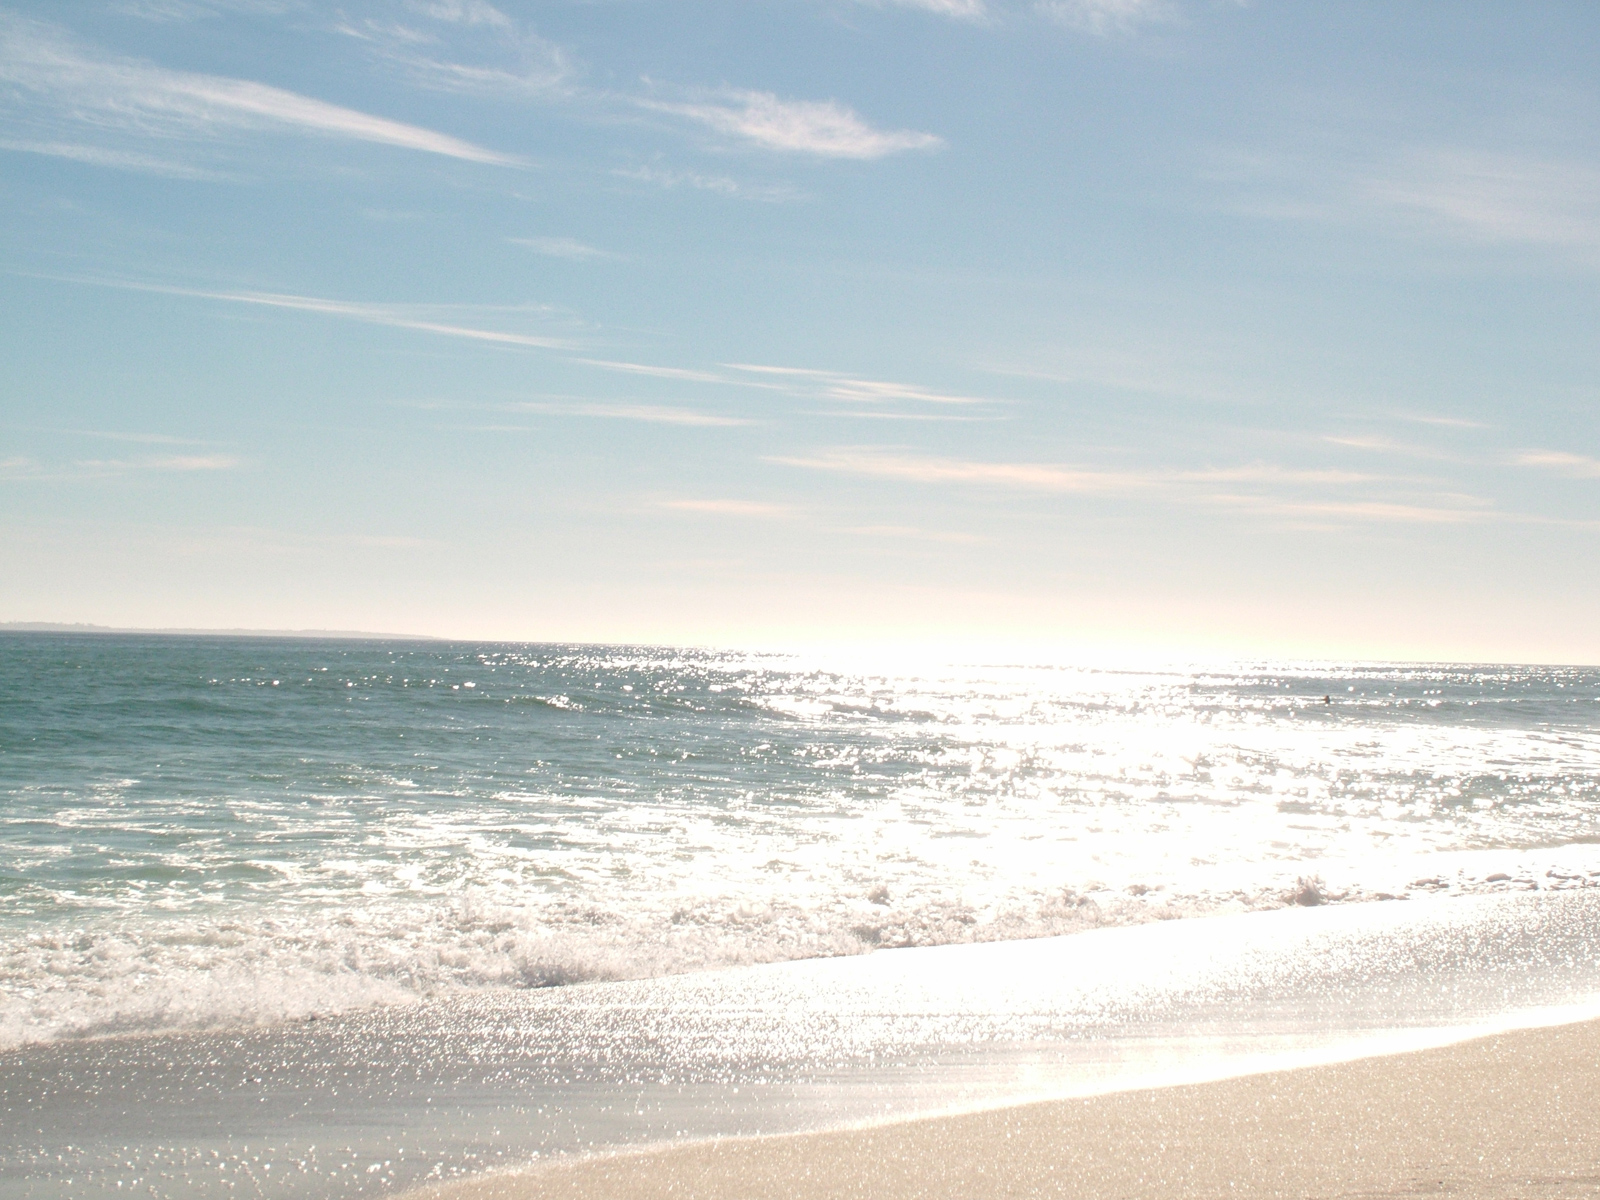 Download Wallpaper Ocean Beach   1600x1200 1600x1200